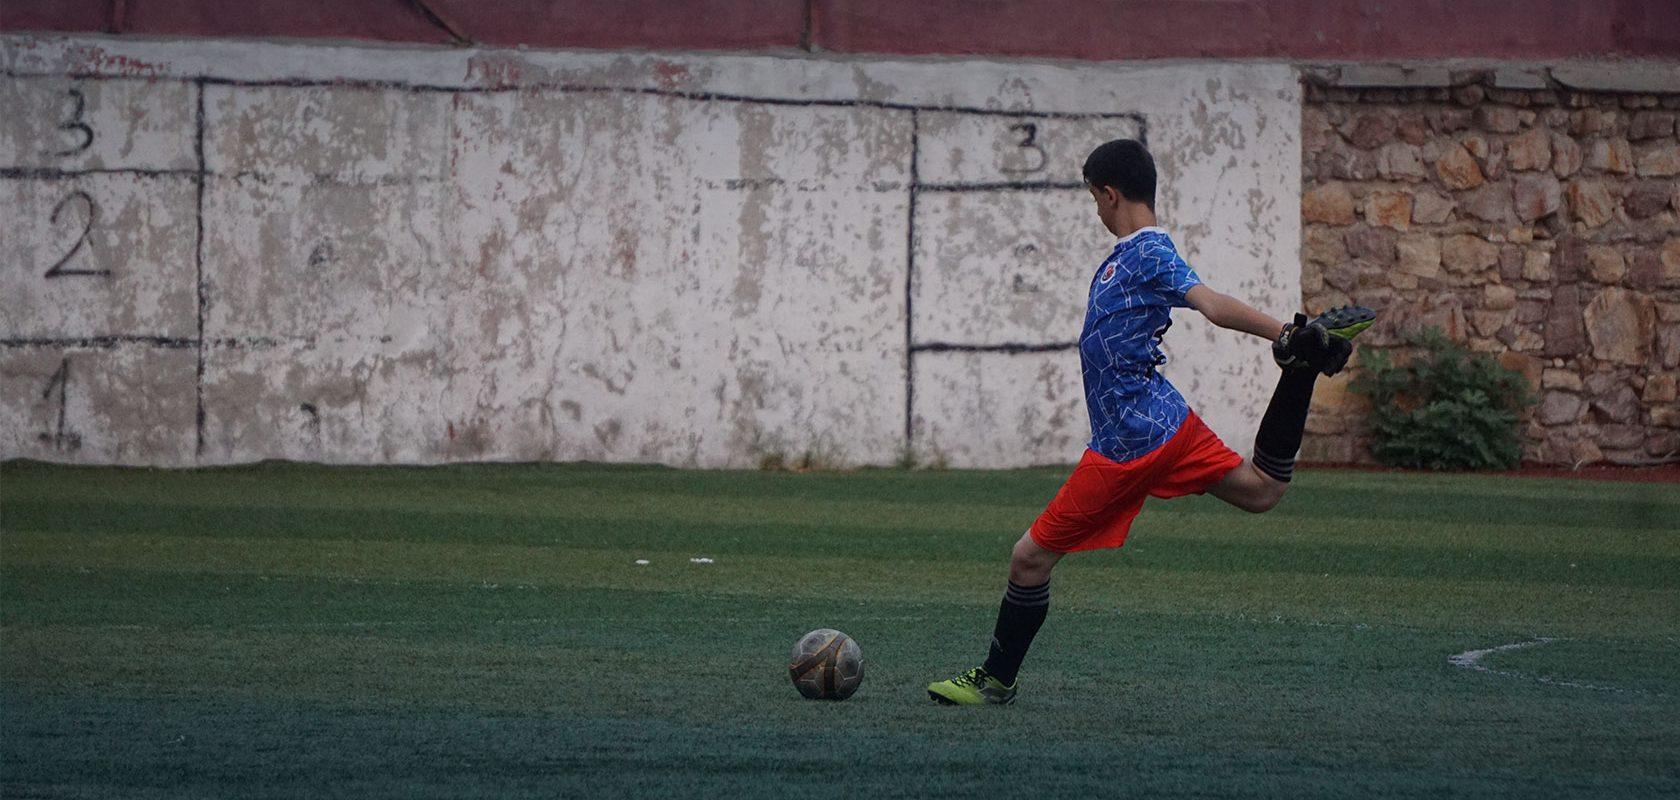 A lone soccer player strikes the ball. Photo: Yasar Kocal.